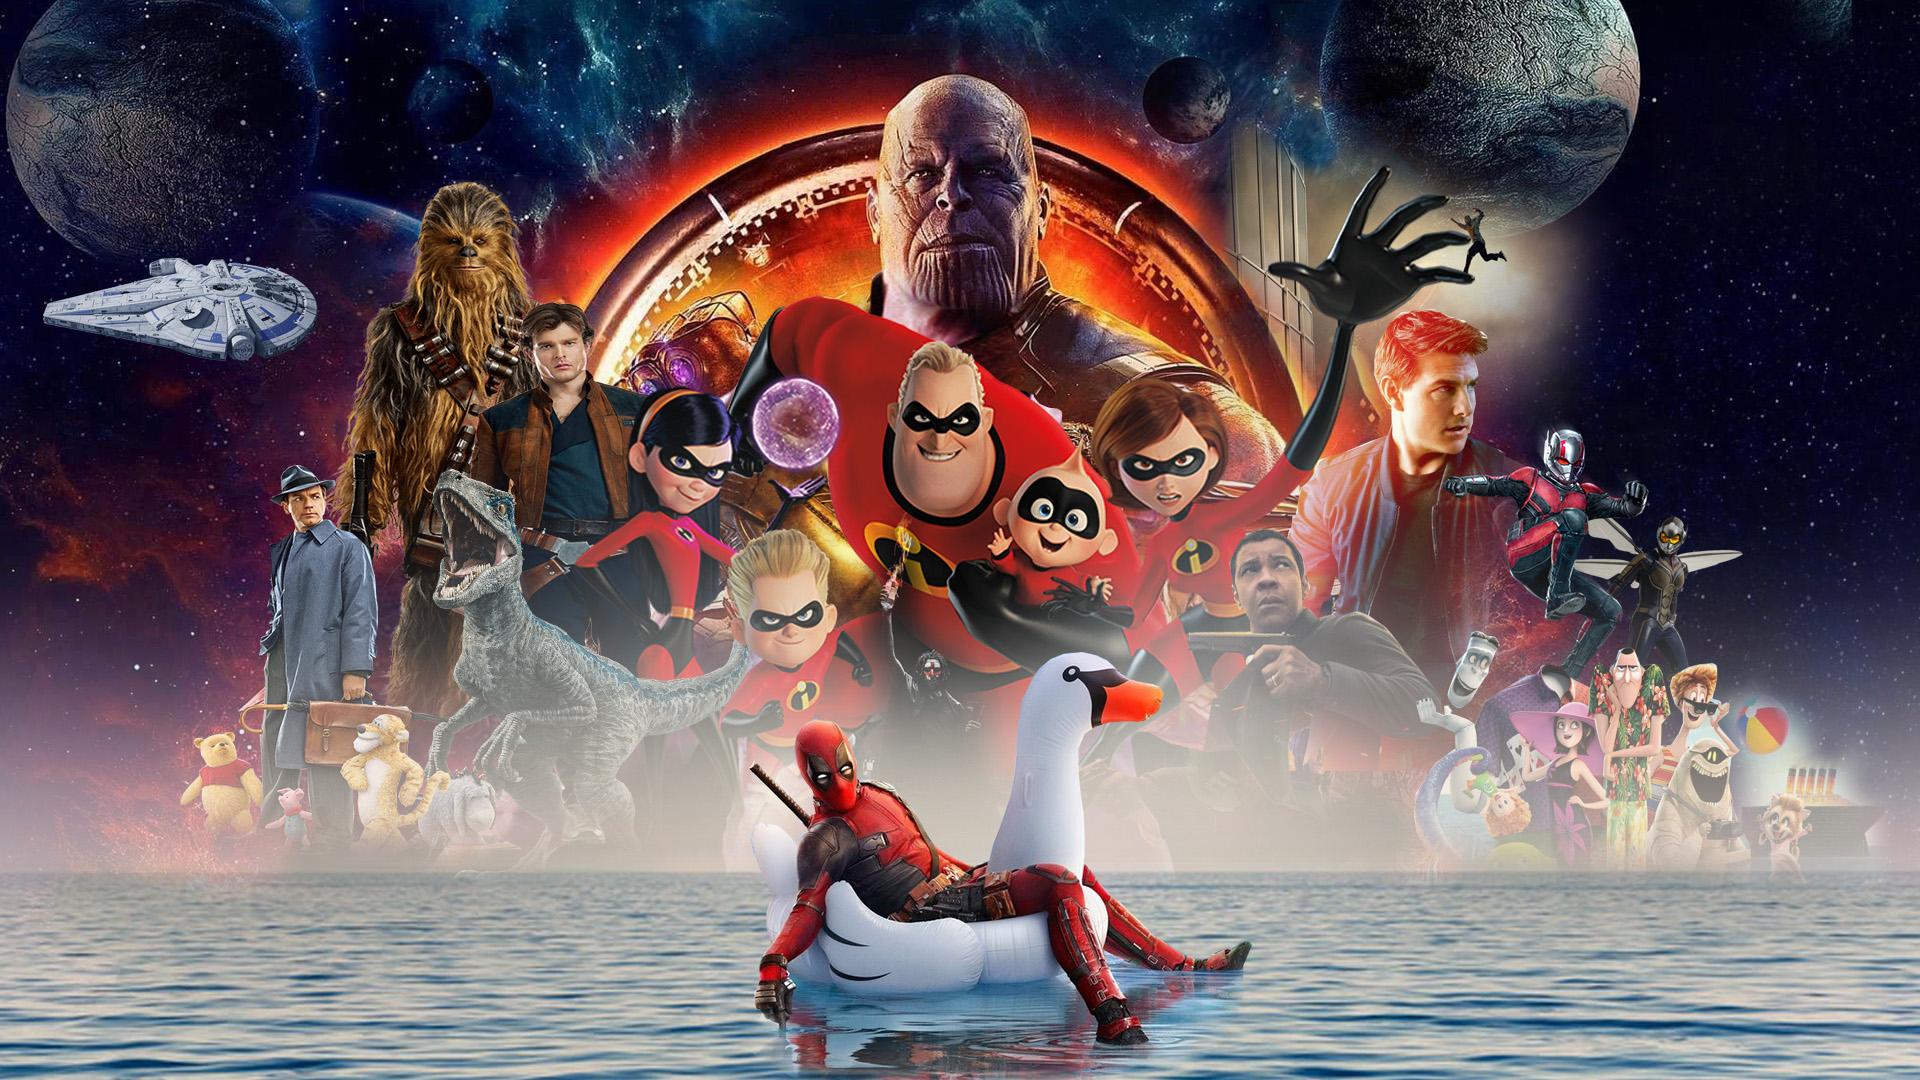 2018 Summer Movies Wallpaper By The Dark Mamba 995 On Deviantart